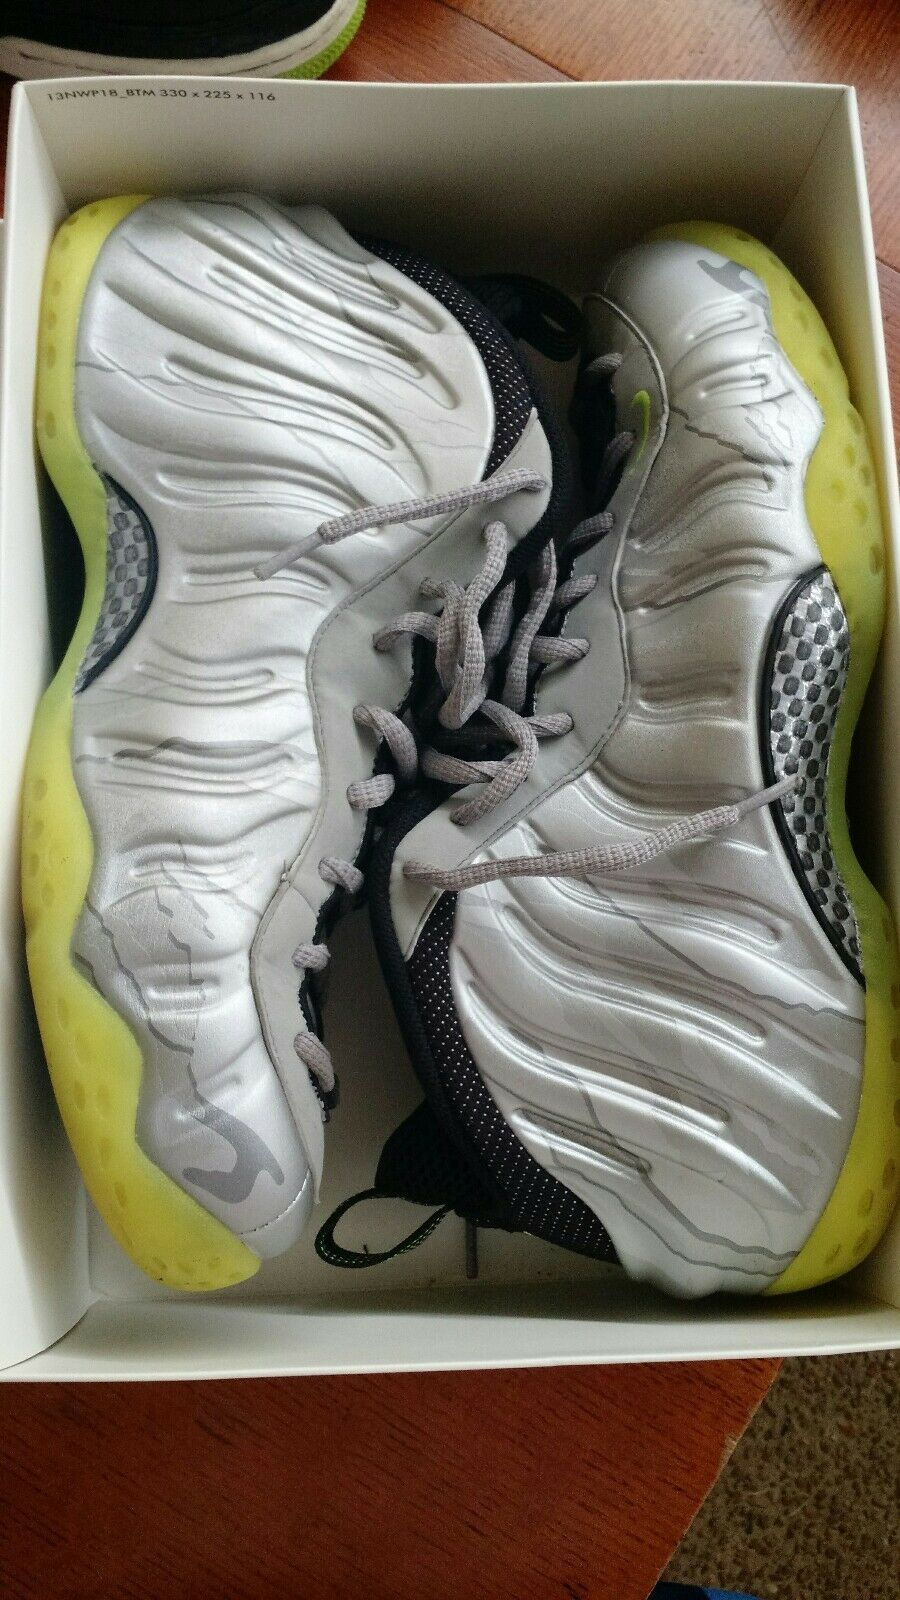 Nike Air Foamposite Size 12 Metallic Silver Volt Camo Foams